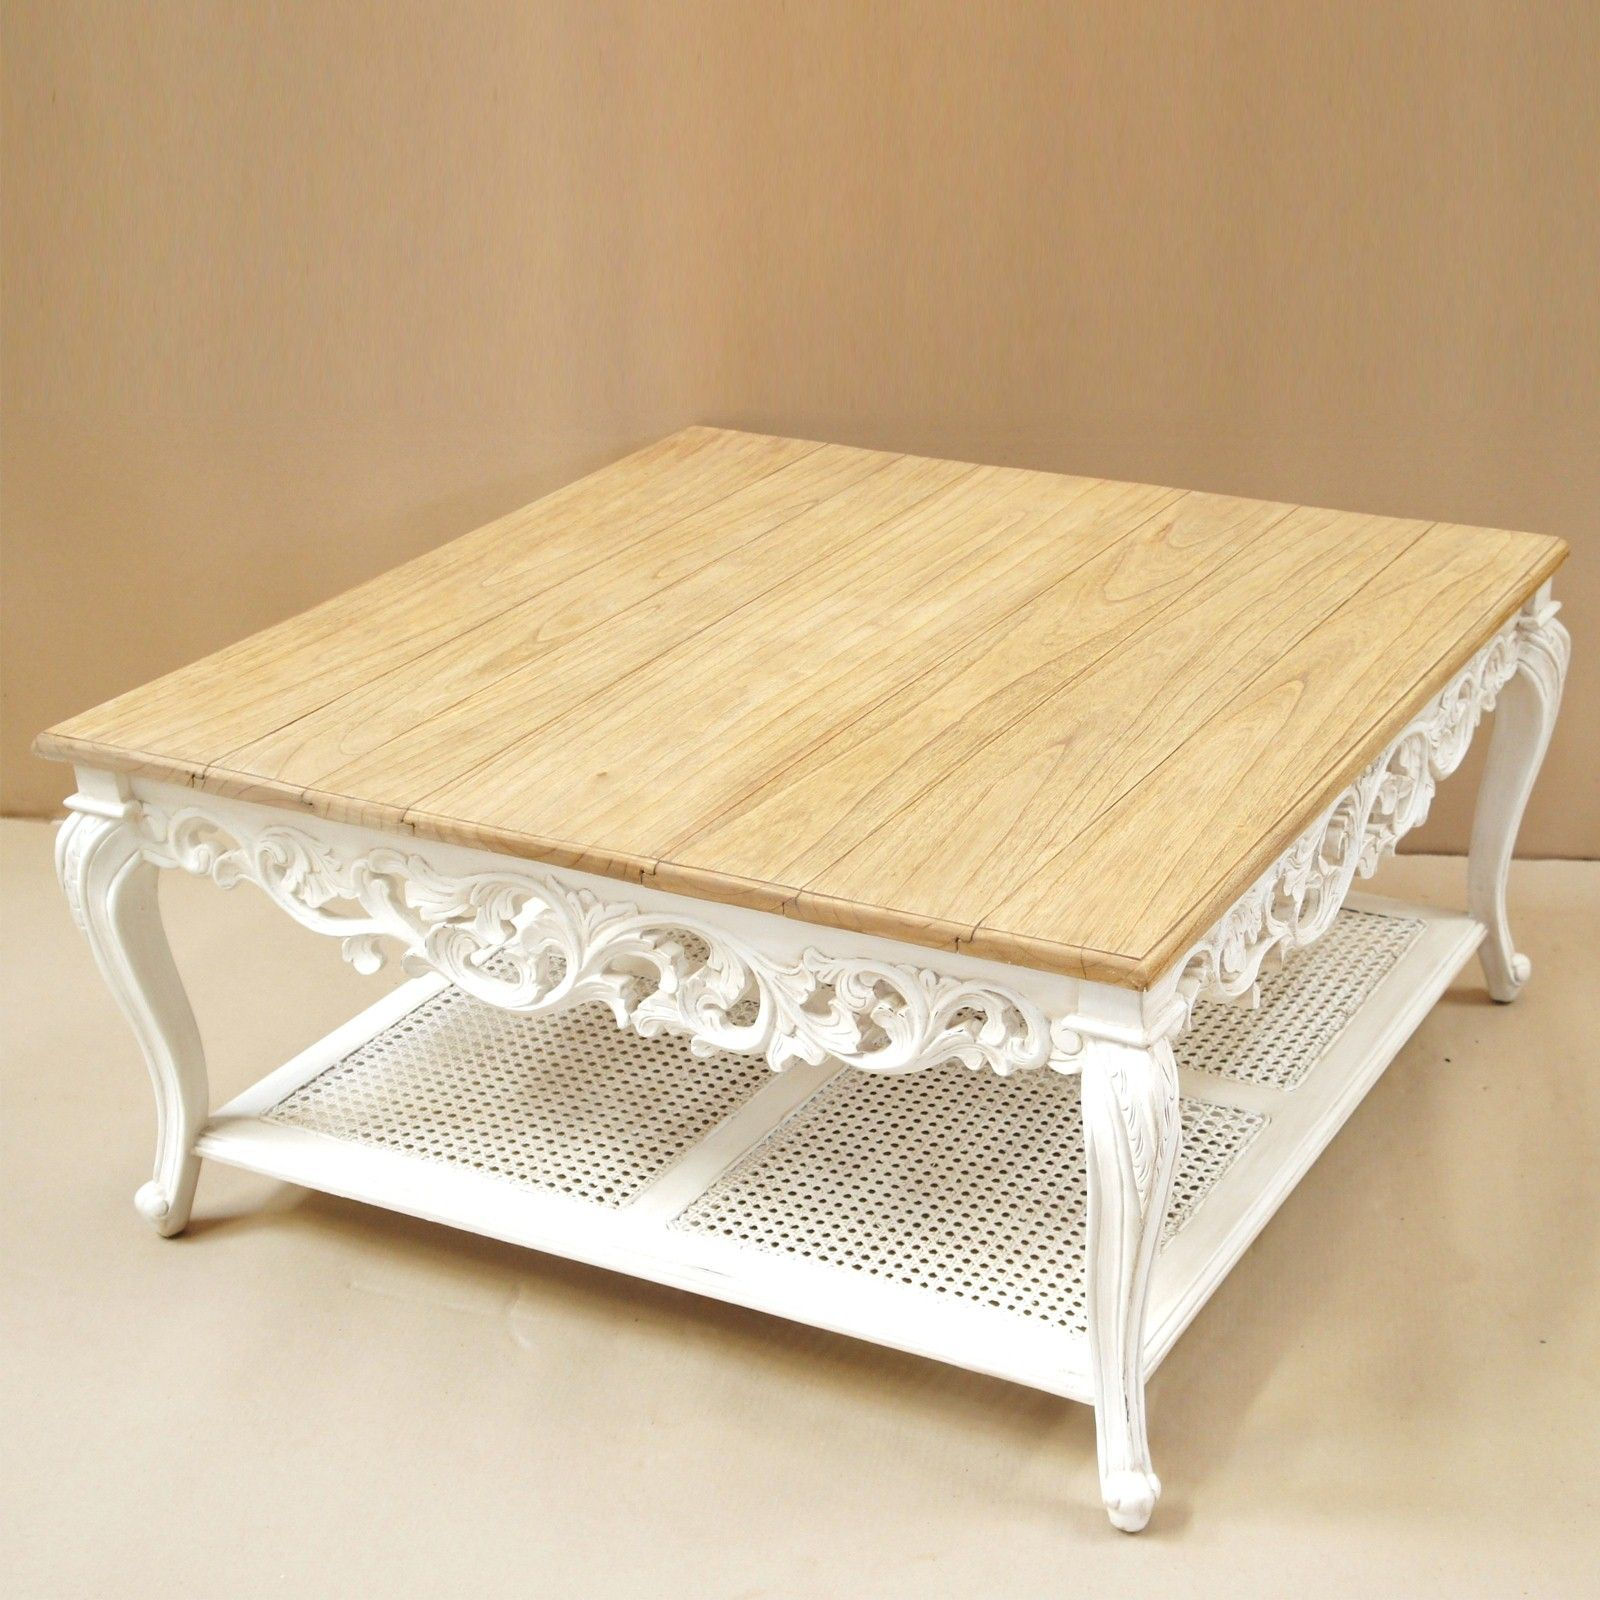 table basse louis xv sculptee patine